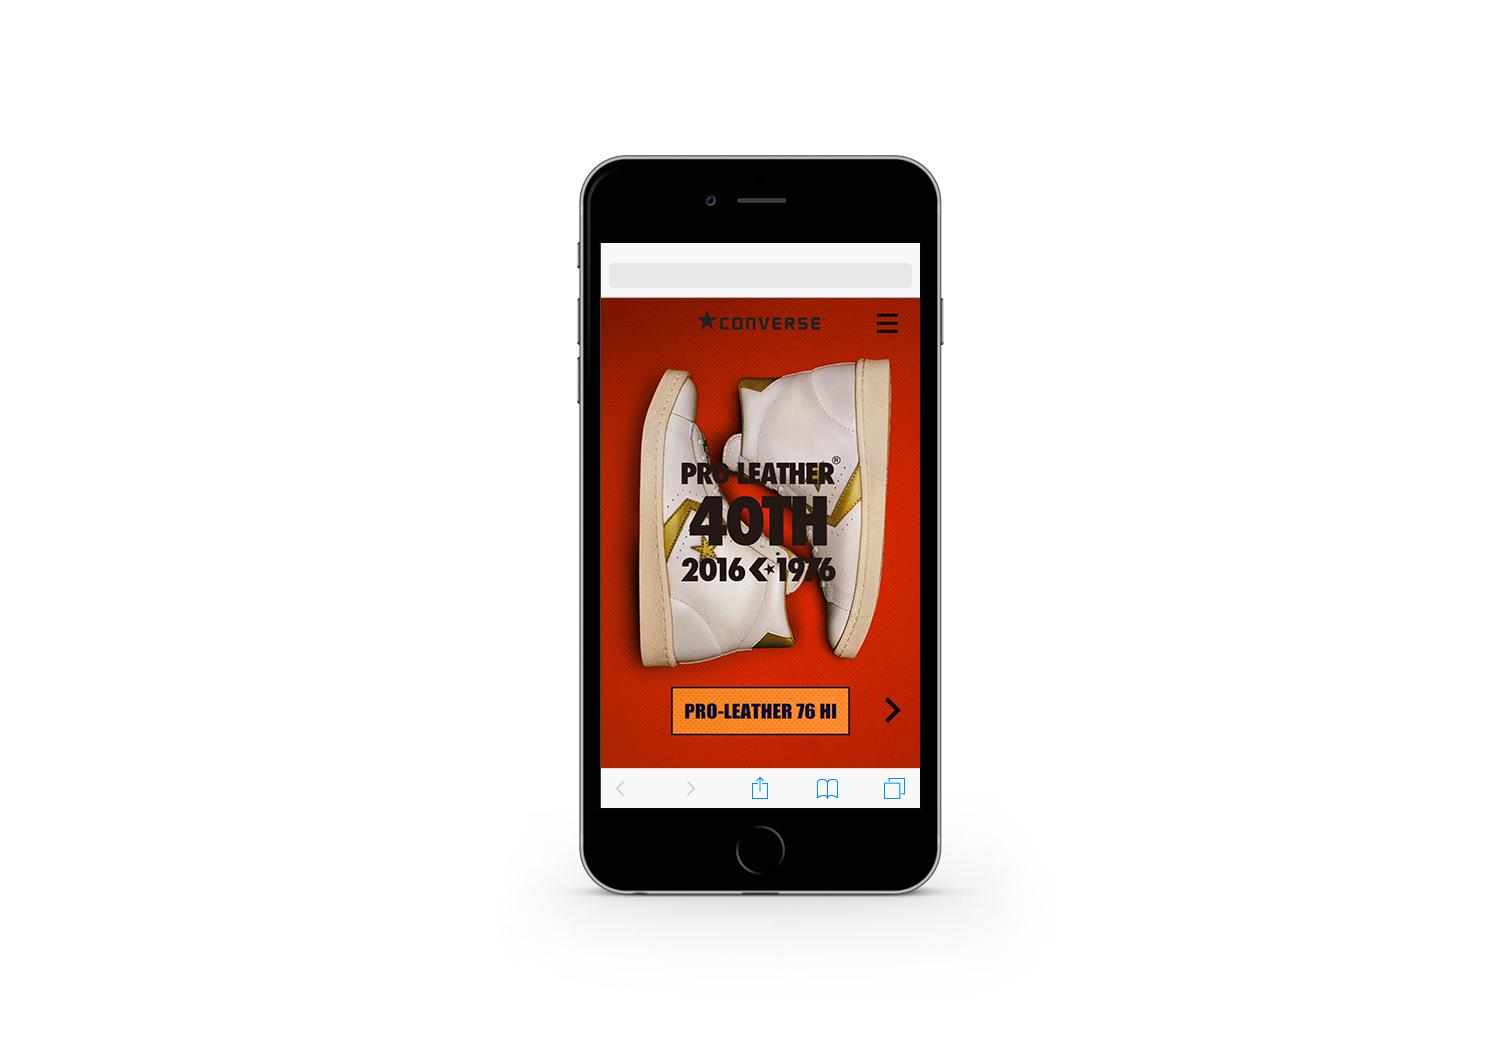 CONVERSE PRO-LEATHER 40TH Smartphone site 2016